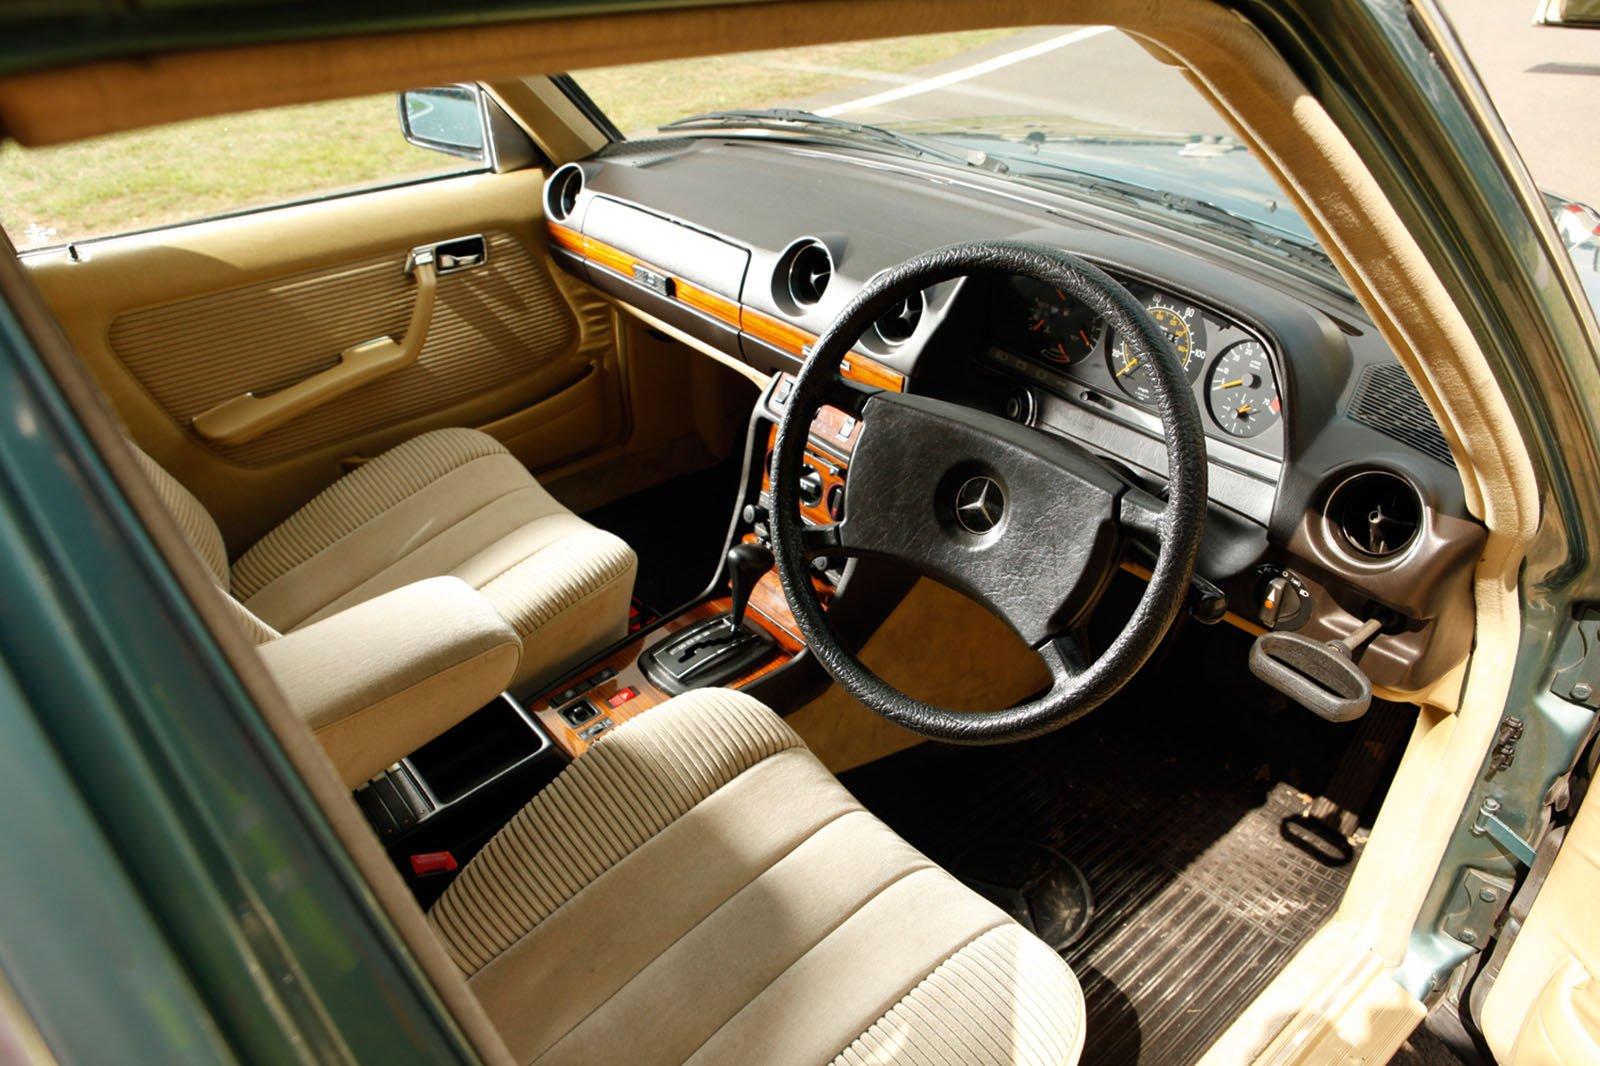 Mercedes W123 dash